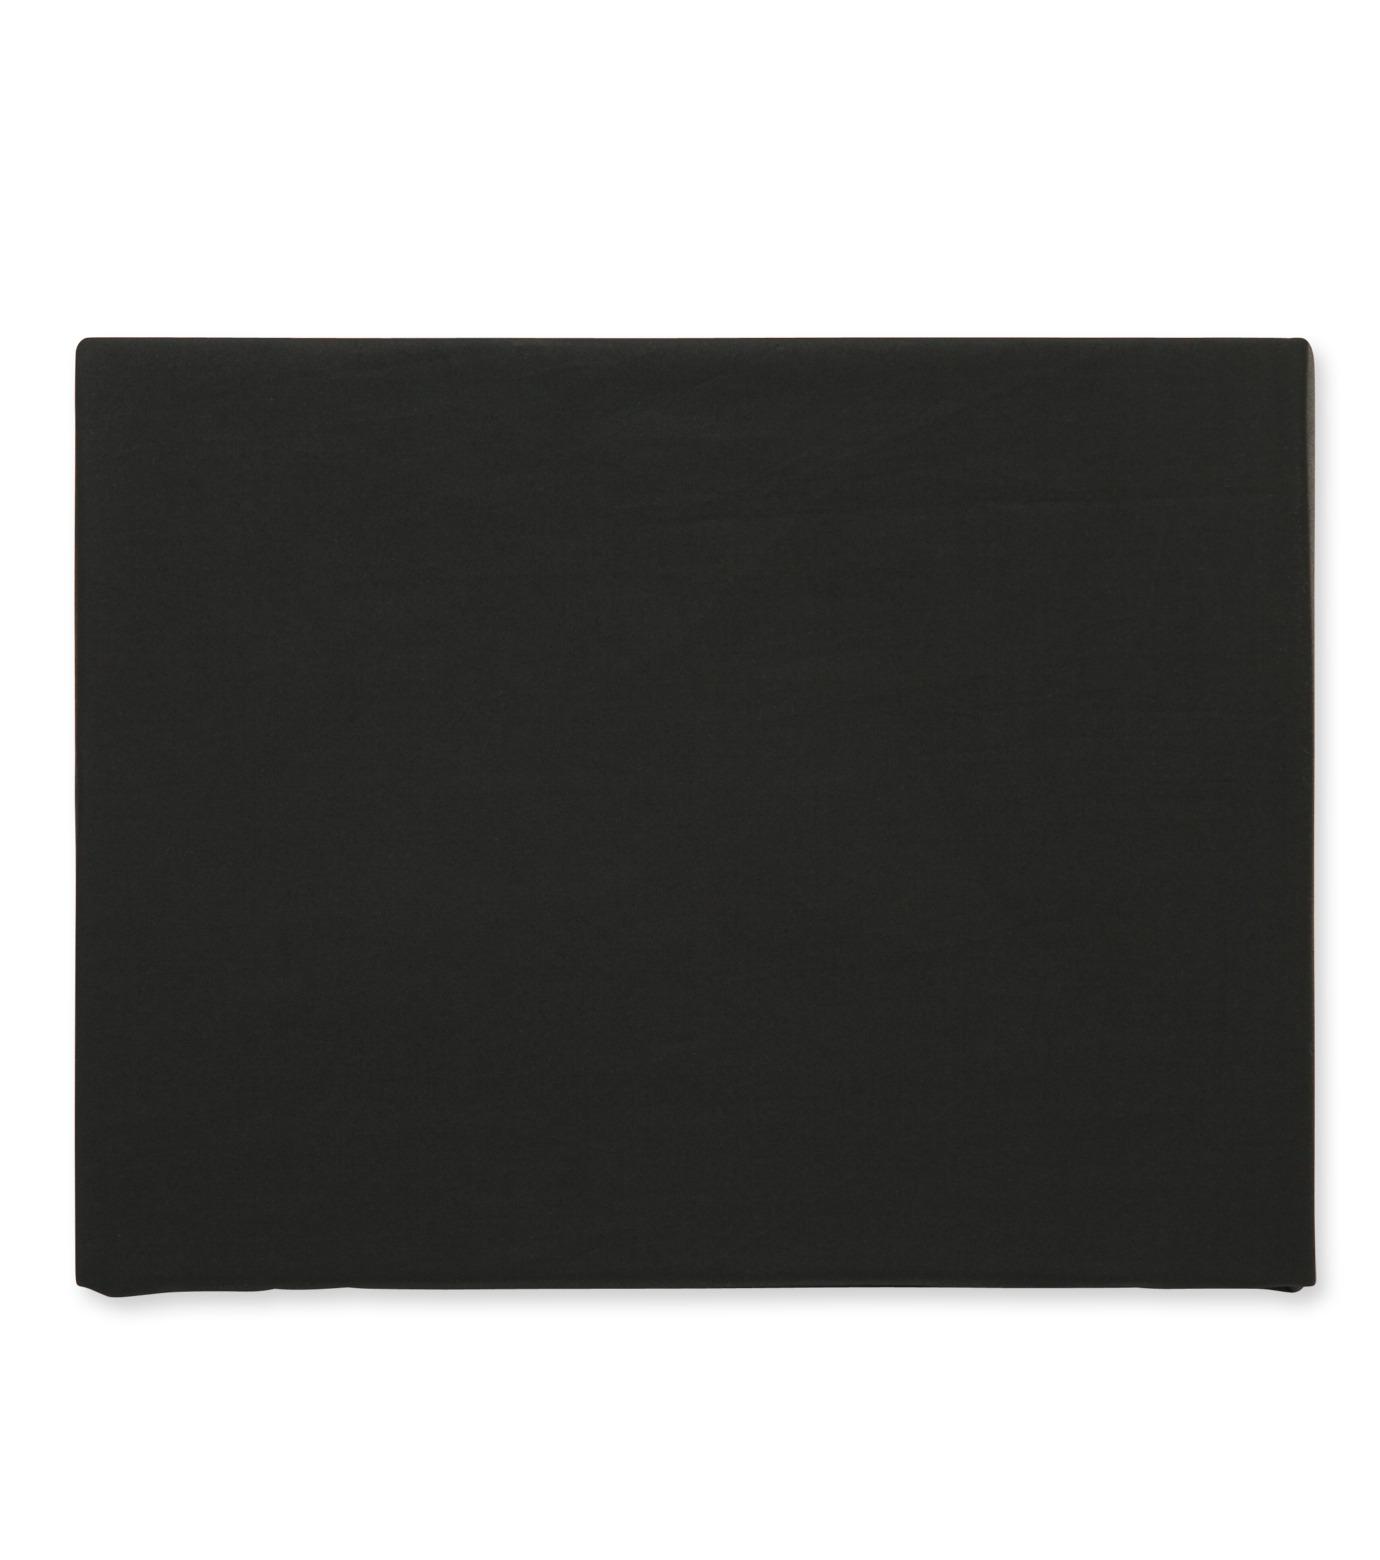 HEY YOU !(ヘイユウ)のBox sheet1/semi double-BLACK(インテリア/interior)-box-sheet-SD-13 拡大詳細画像1